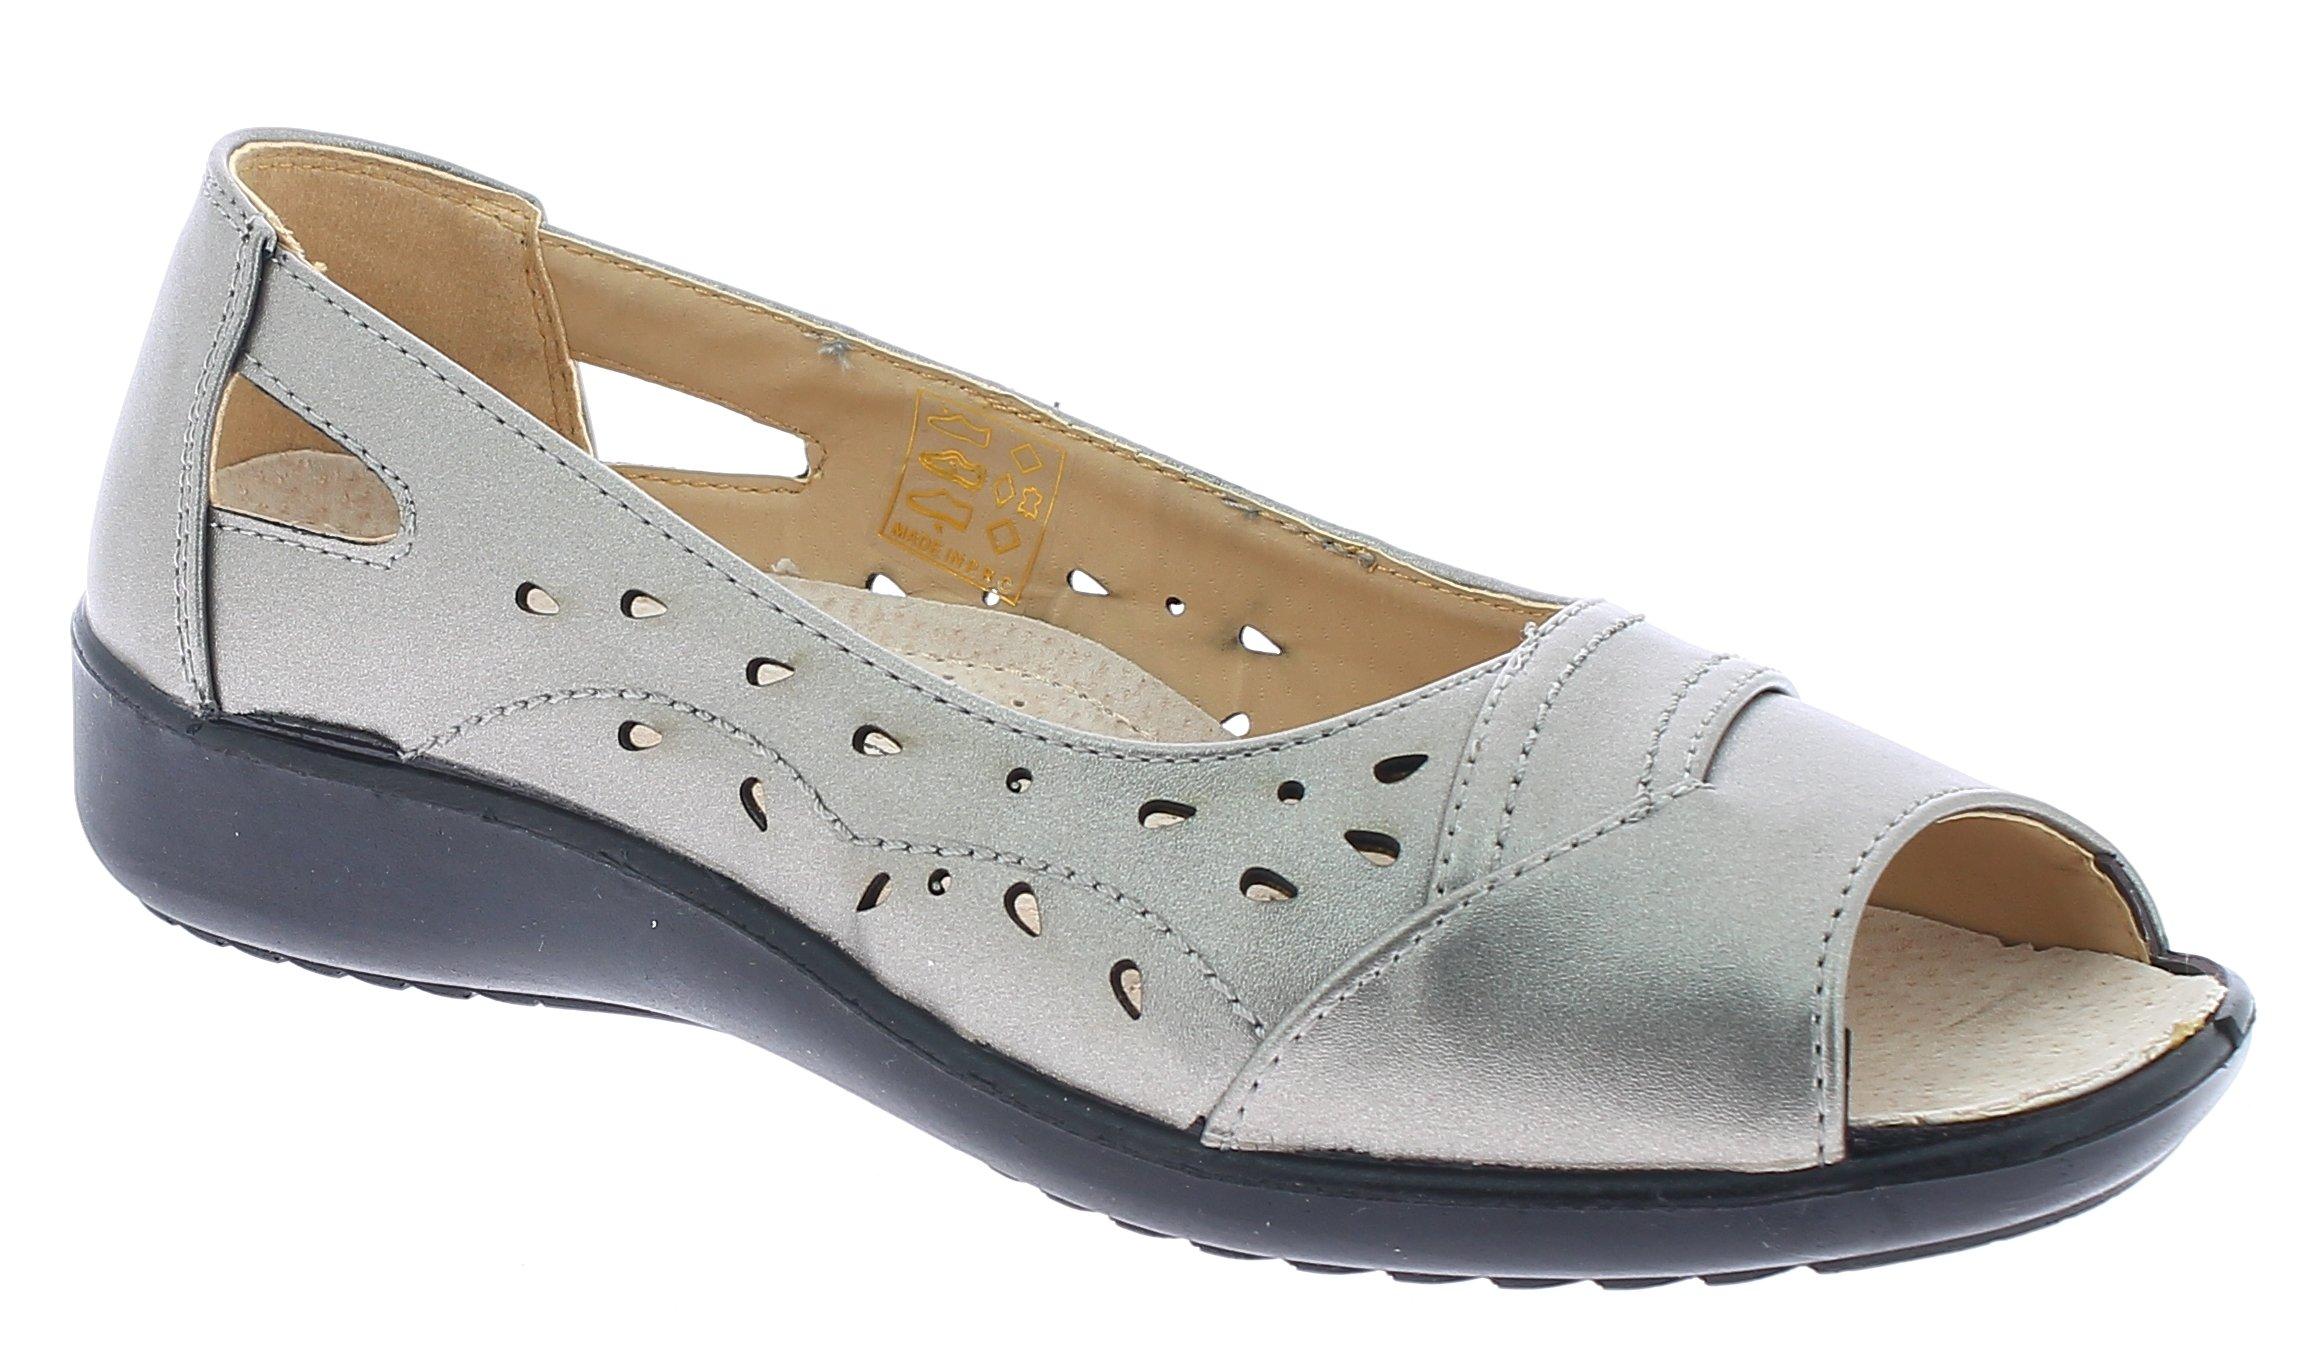 ANTRIN Γυναικείο Comfort MEGAN-105 Ασημί - IqShoes - MEGAN-105 PEWTER-silver-36/ παπούτσια  πέδιλα